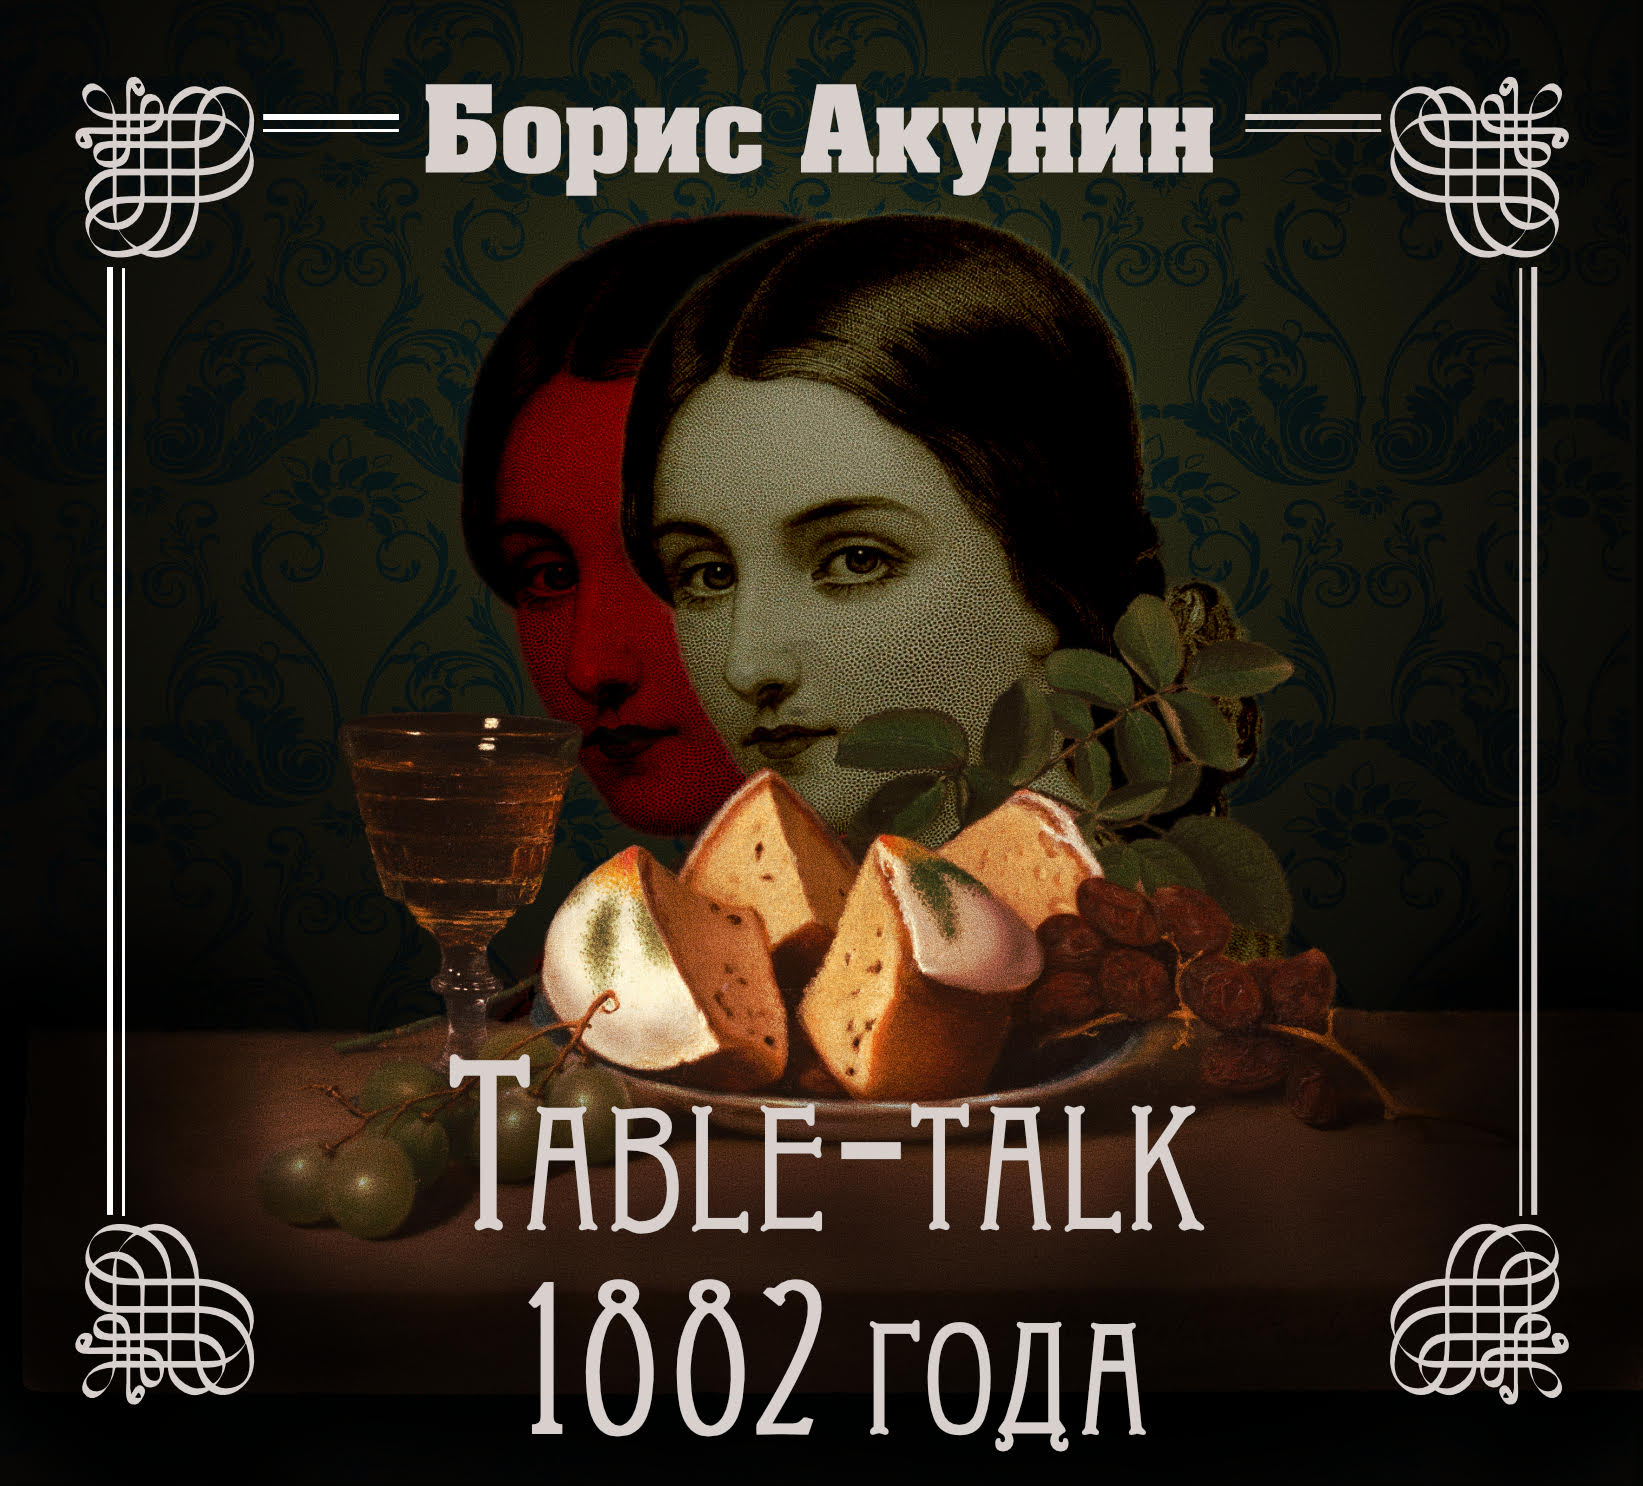 Купить книгу Table-talk 1882 года, автора Бориса Акунина